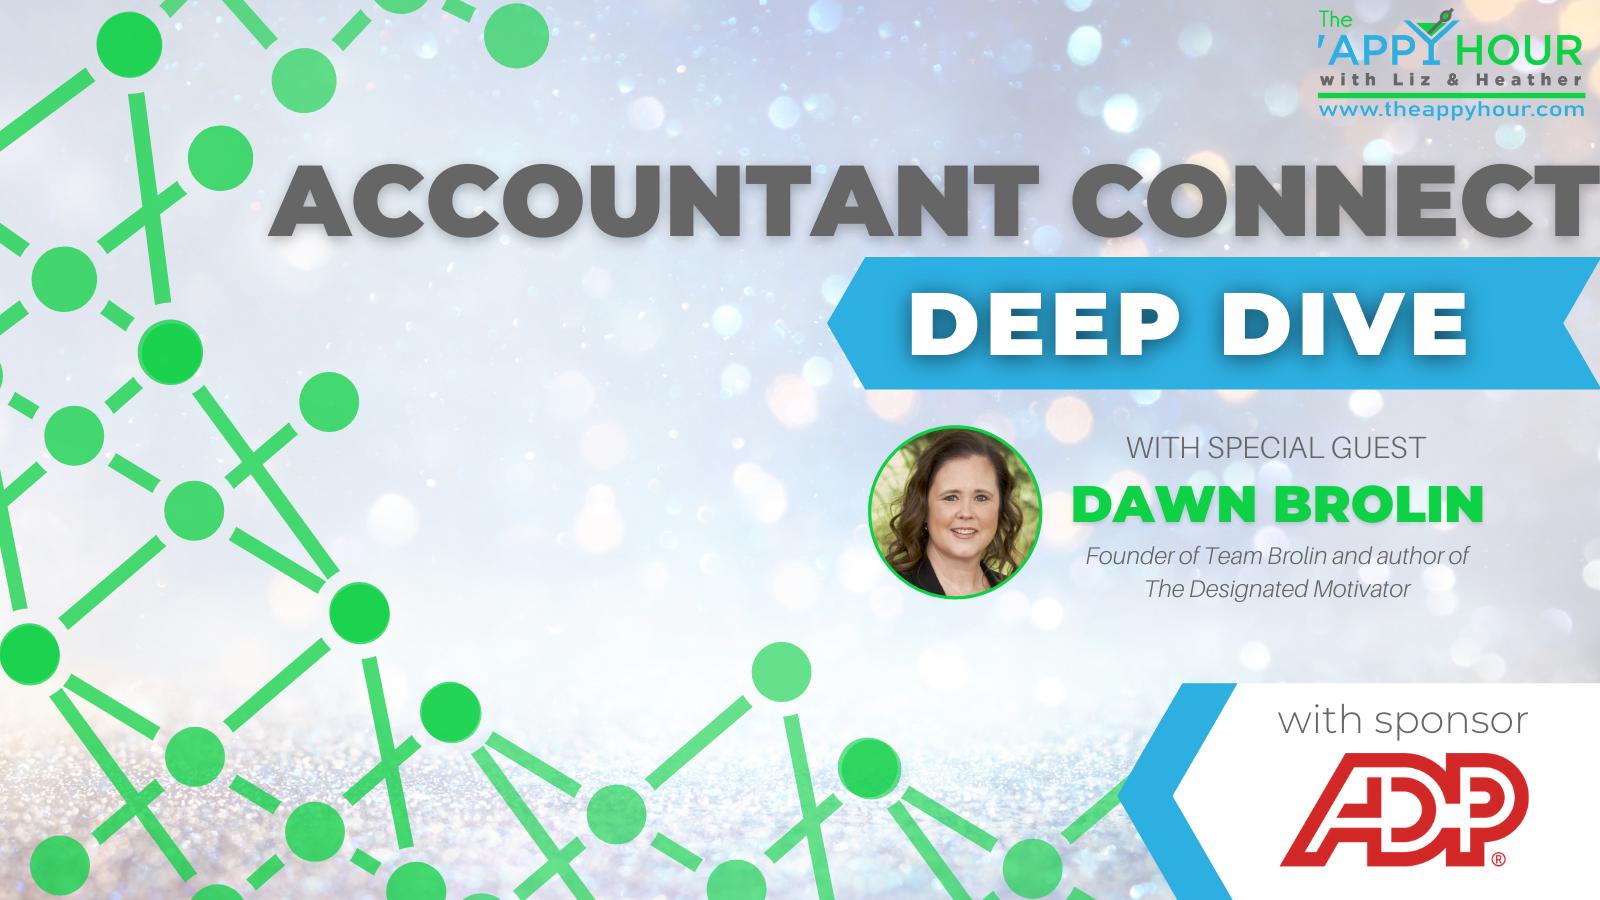 Accountant Connect DEEP DIVE